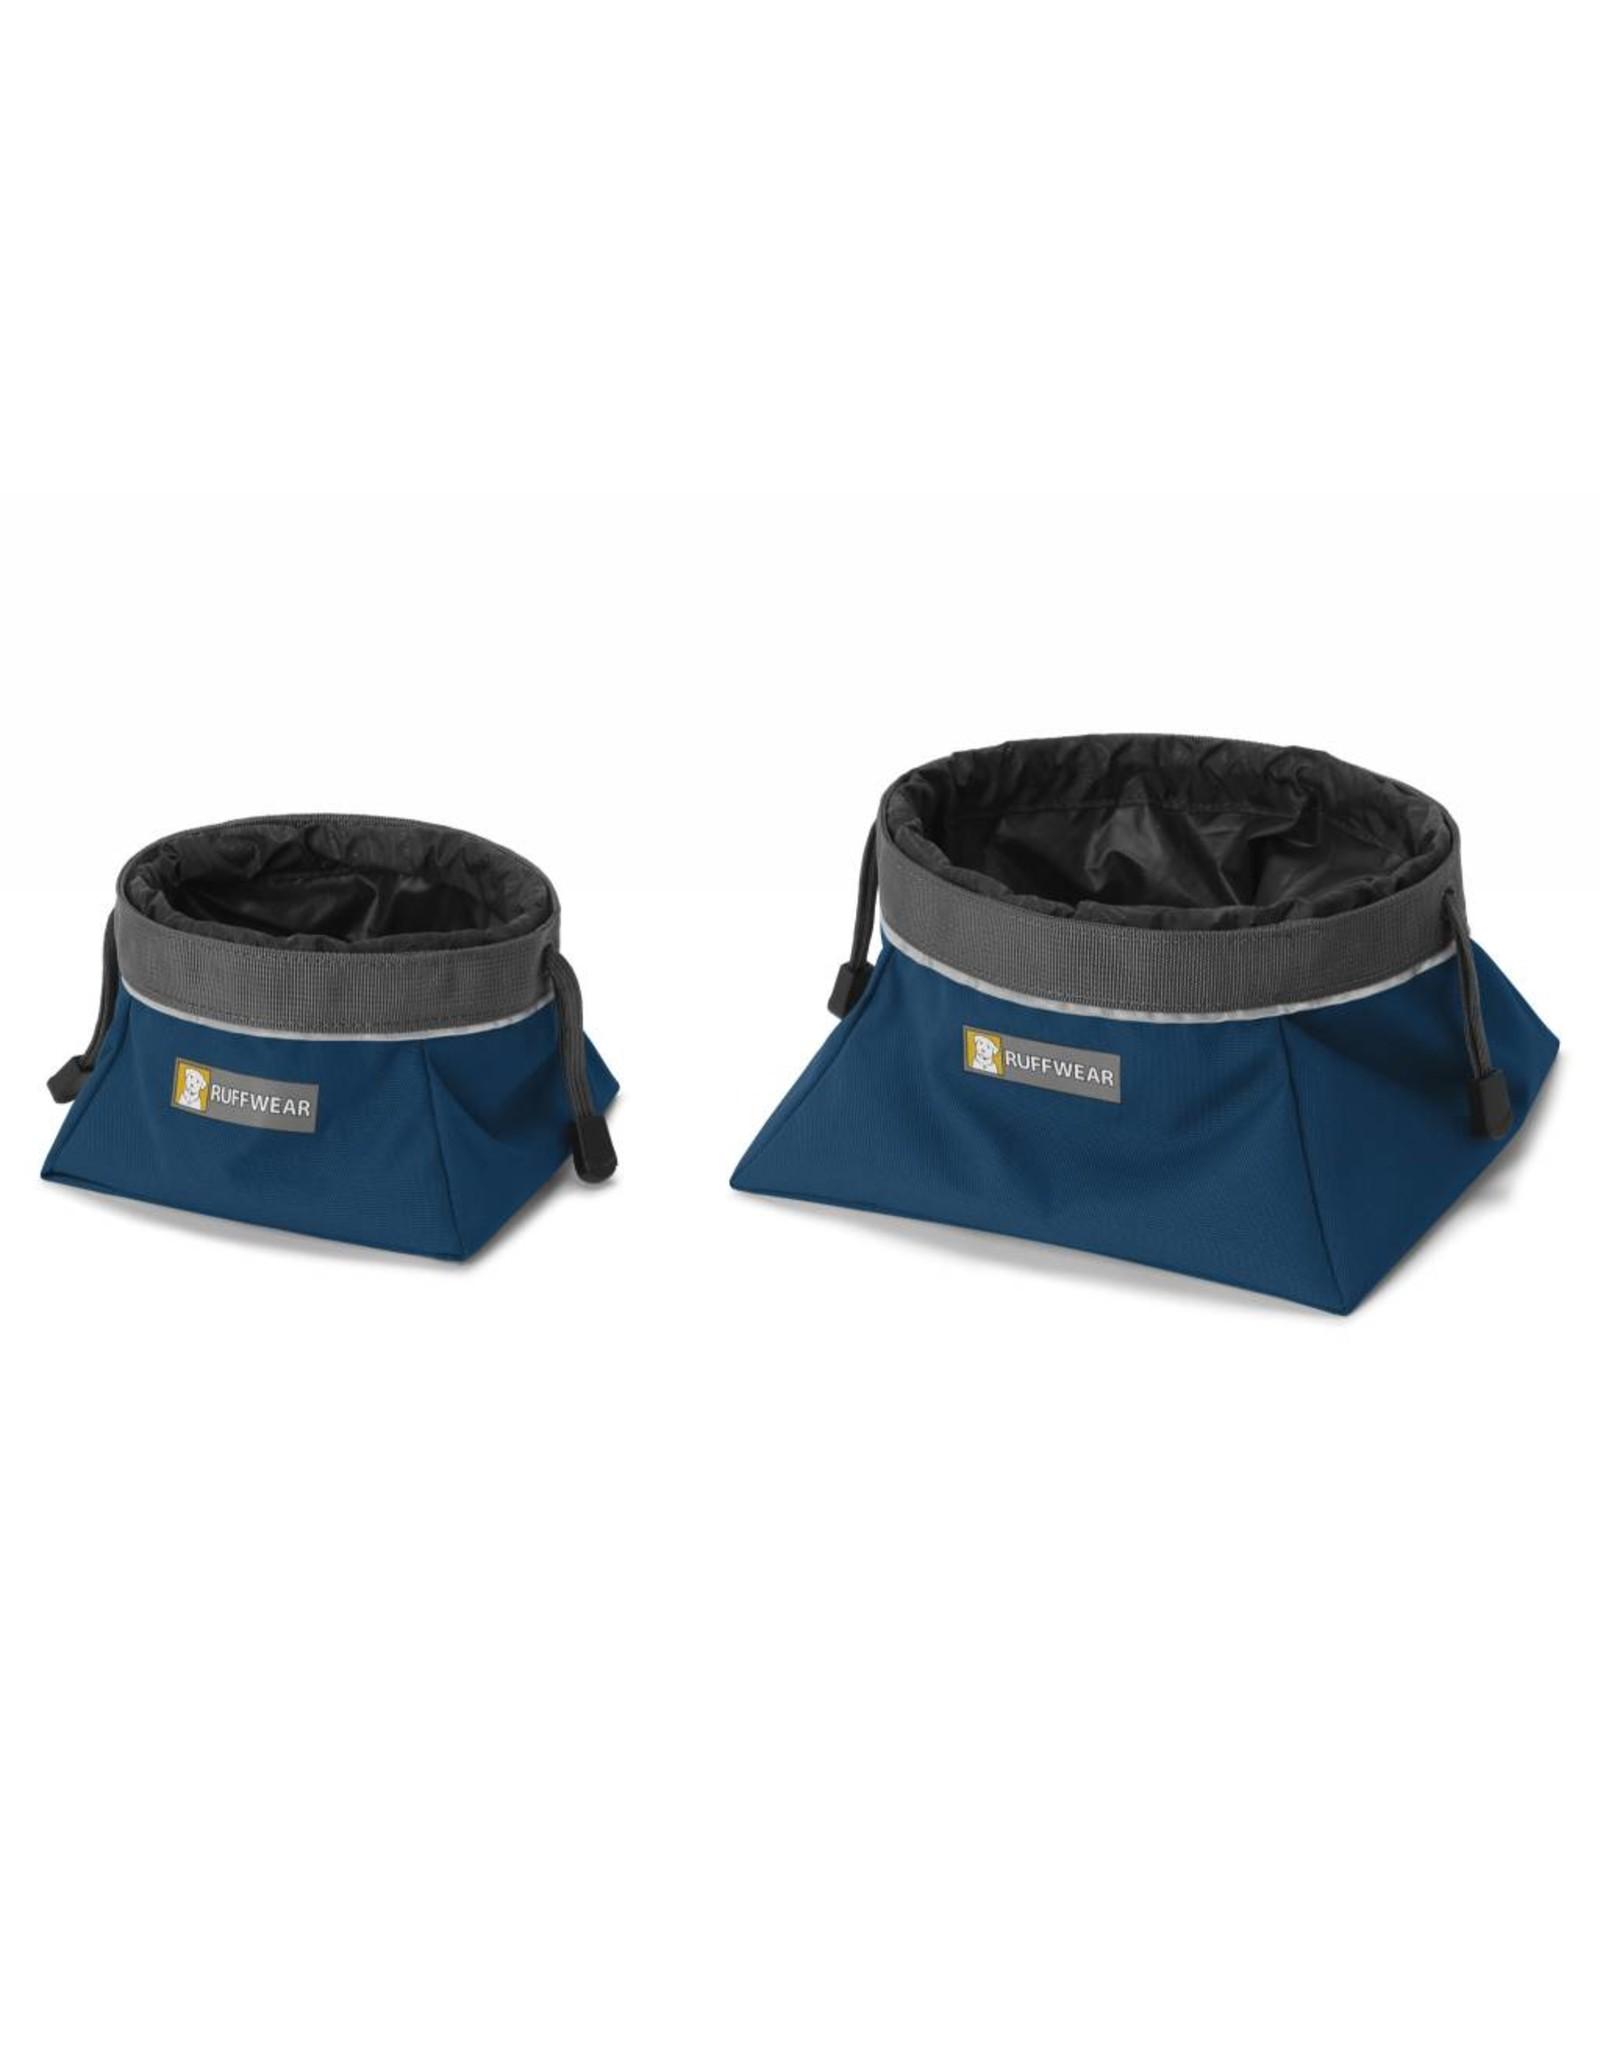 Ruffwear Quencher Cinch Top™